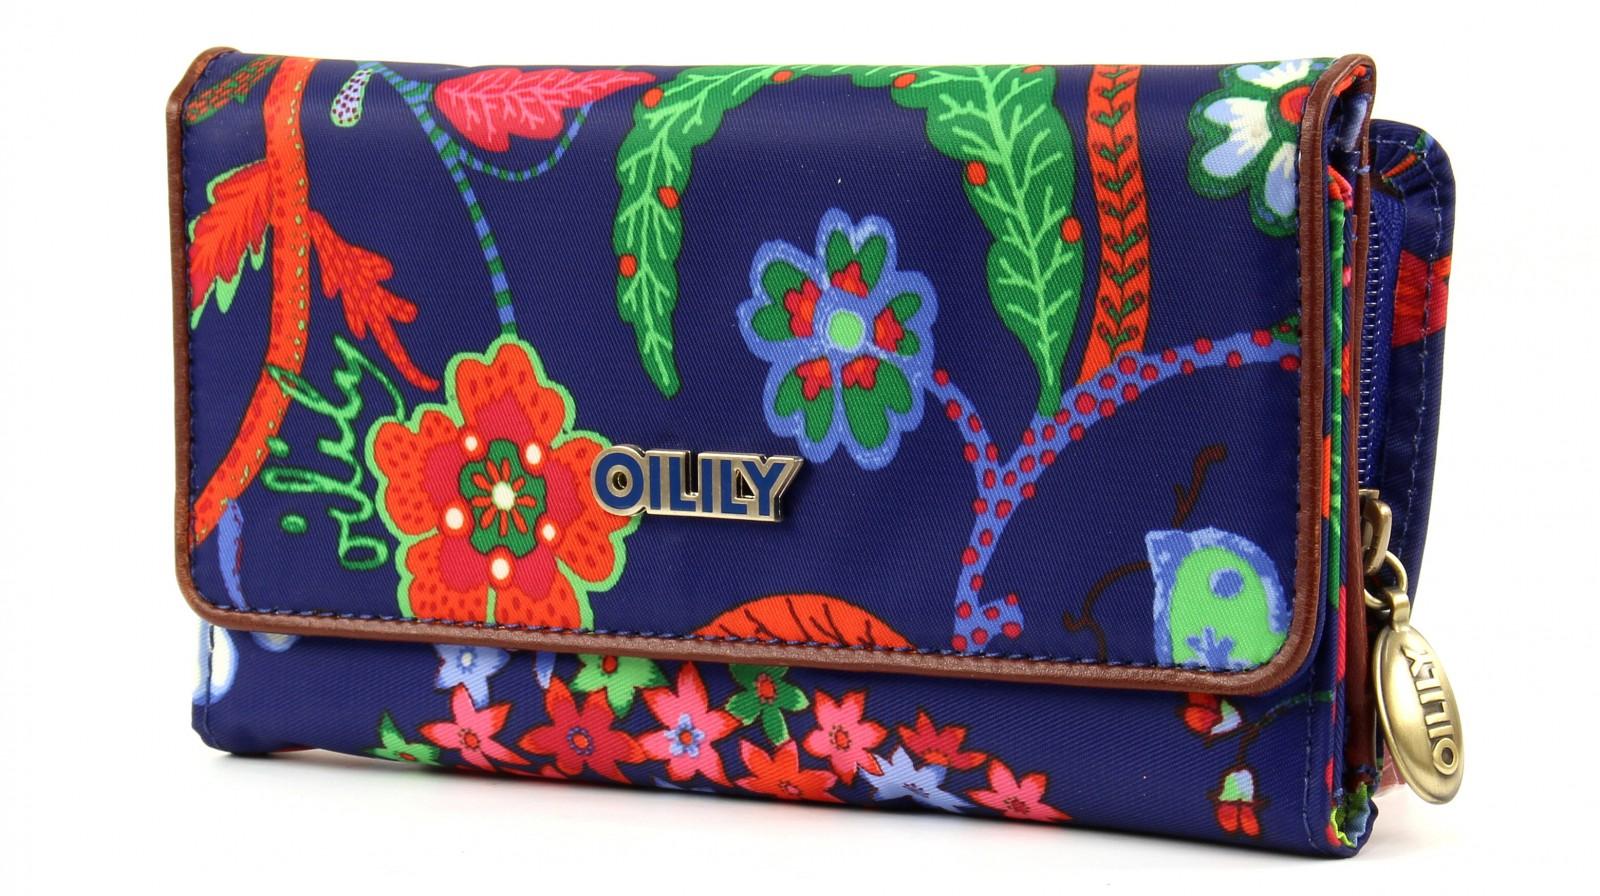 oilily l wallet geldb rse portemonnaie blau navy mehrfarbig. Black Bedroom Furniture Sets. Home Design Ideas